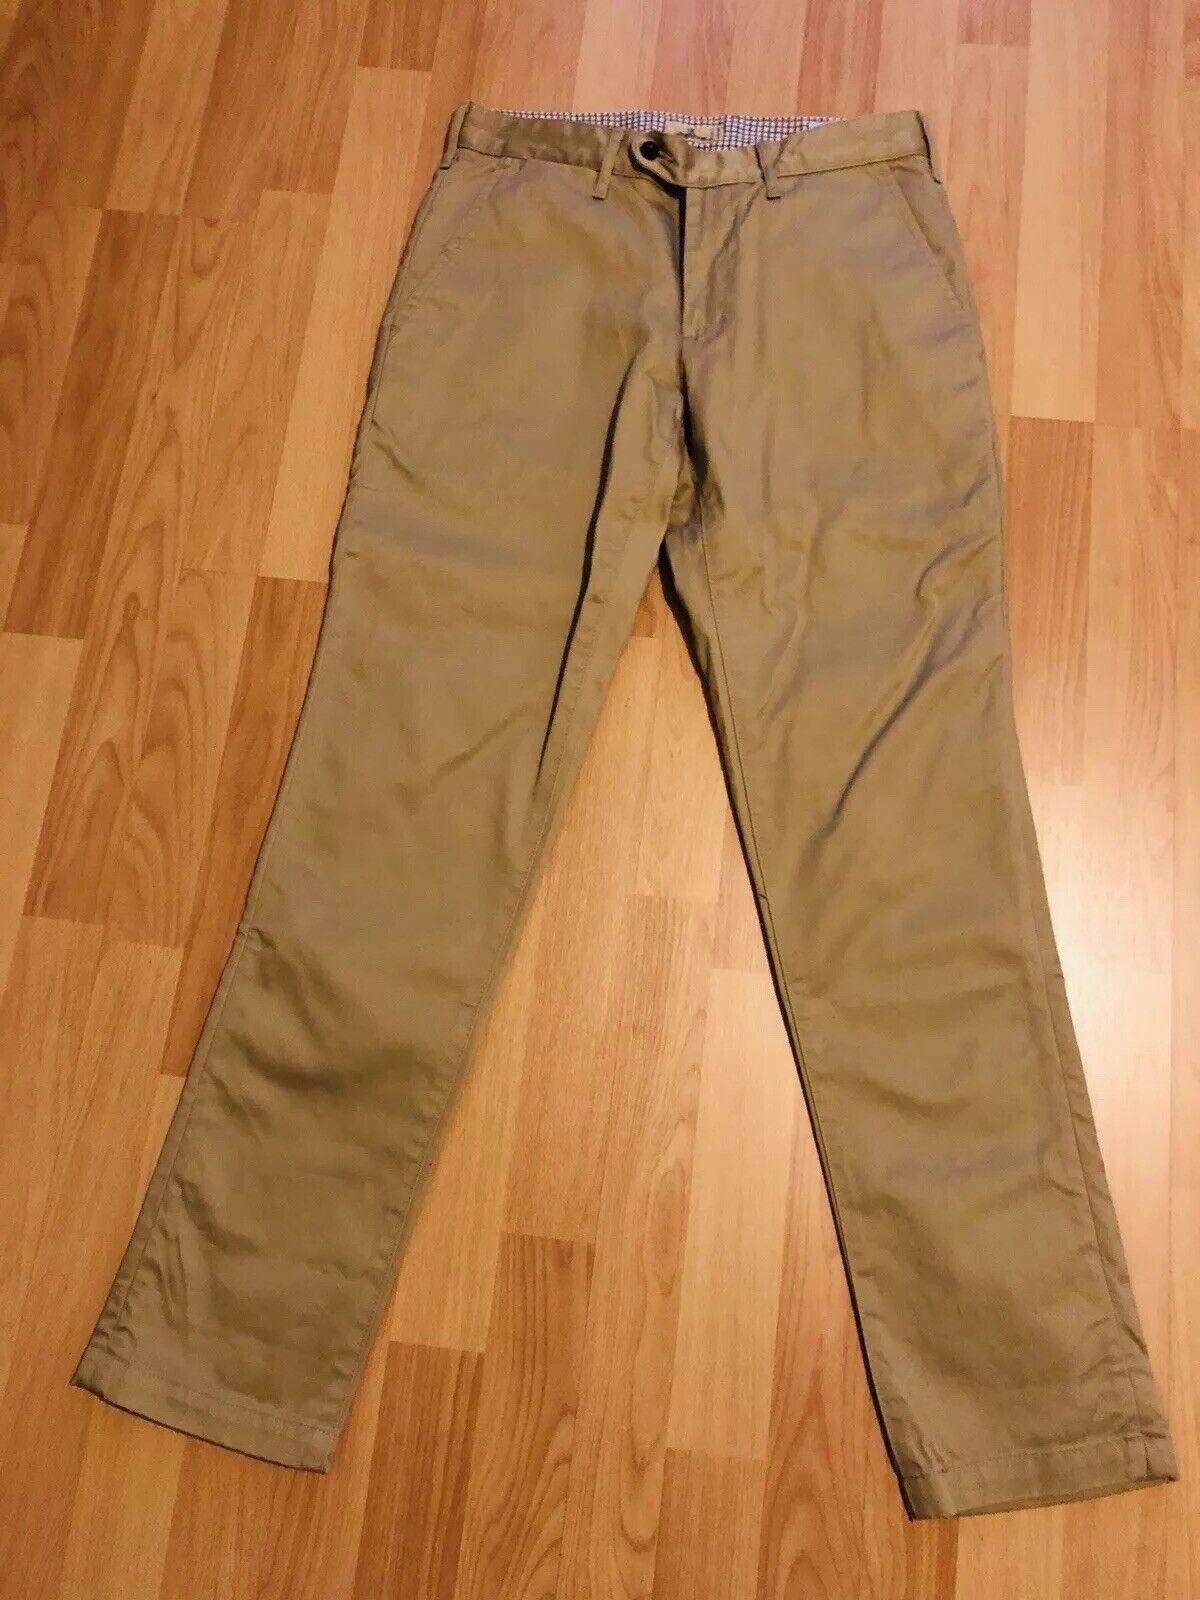 Original Original Original Japan Blau JB4400 Classic Chino City Trousers Jeans Beige W32 ee9a0e